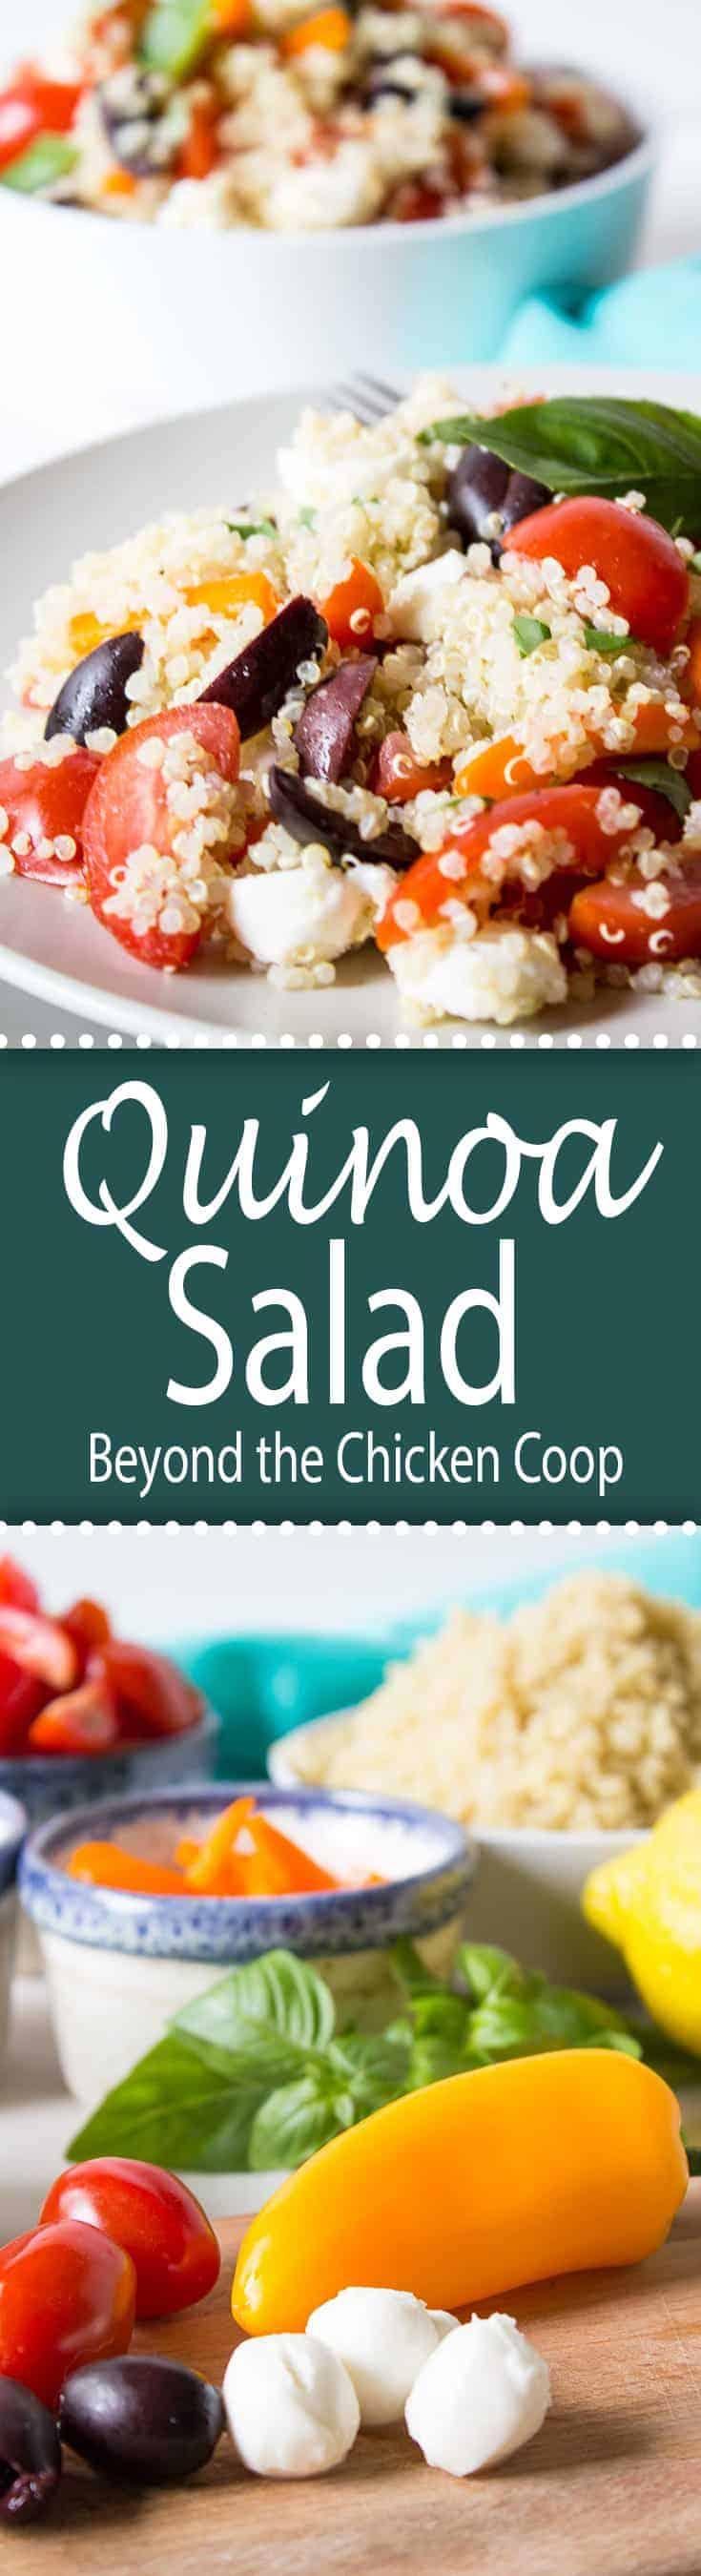 Quinoa salad with fresh veggies, mozzarella cheese, kalamata olives and lemon juice.